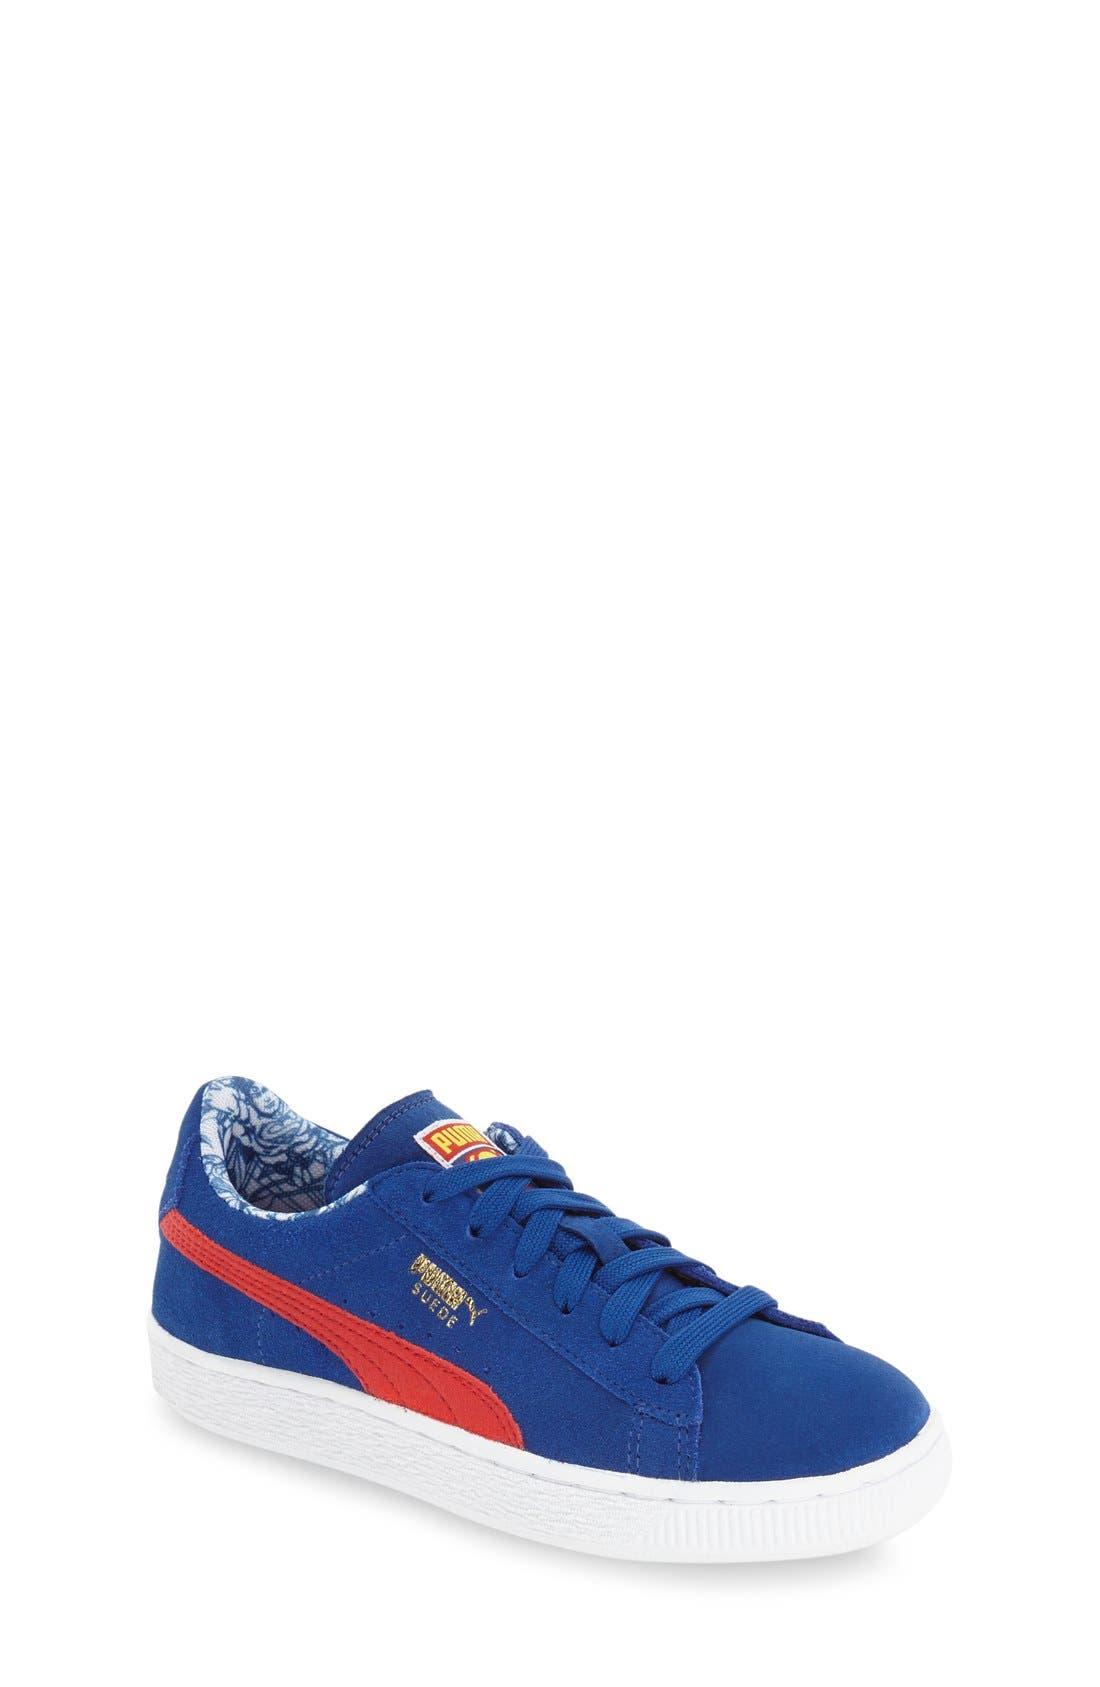 PUMA Suede - Superman Sneaker